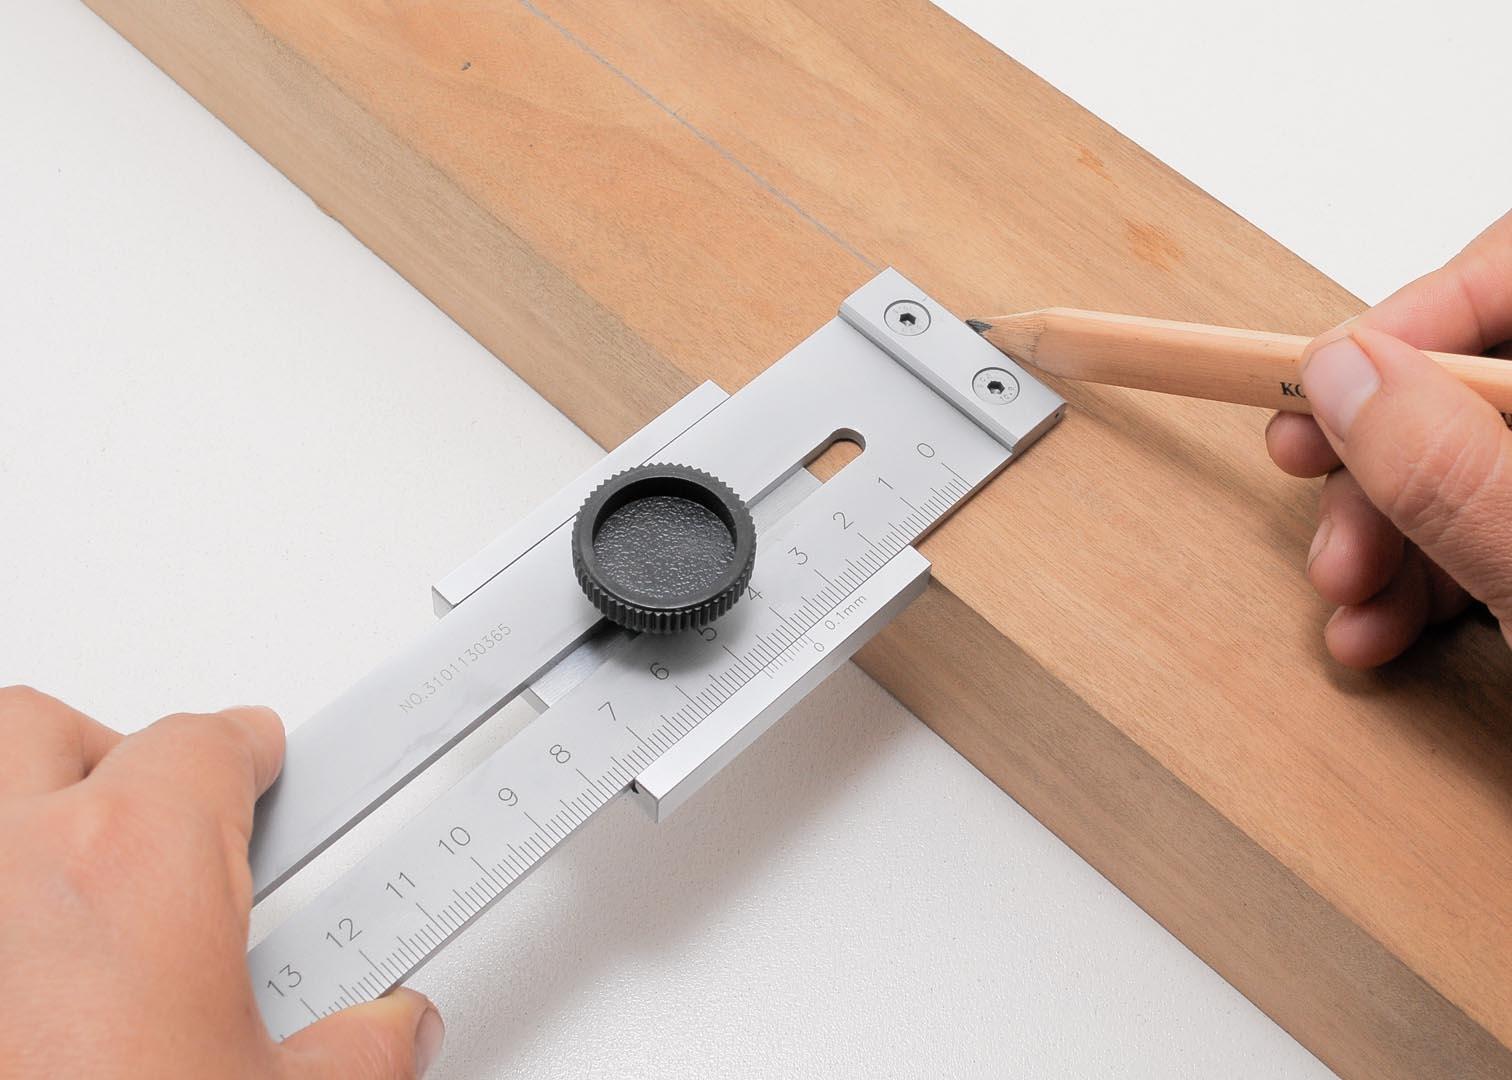 7120-200A-Gramil regla de precision para marcar 0-200mm INSIZE 7120-200A-max-8.